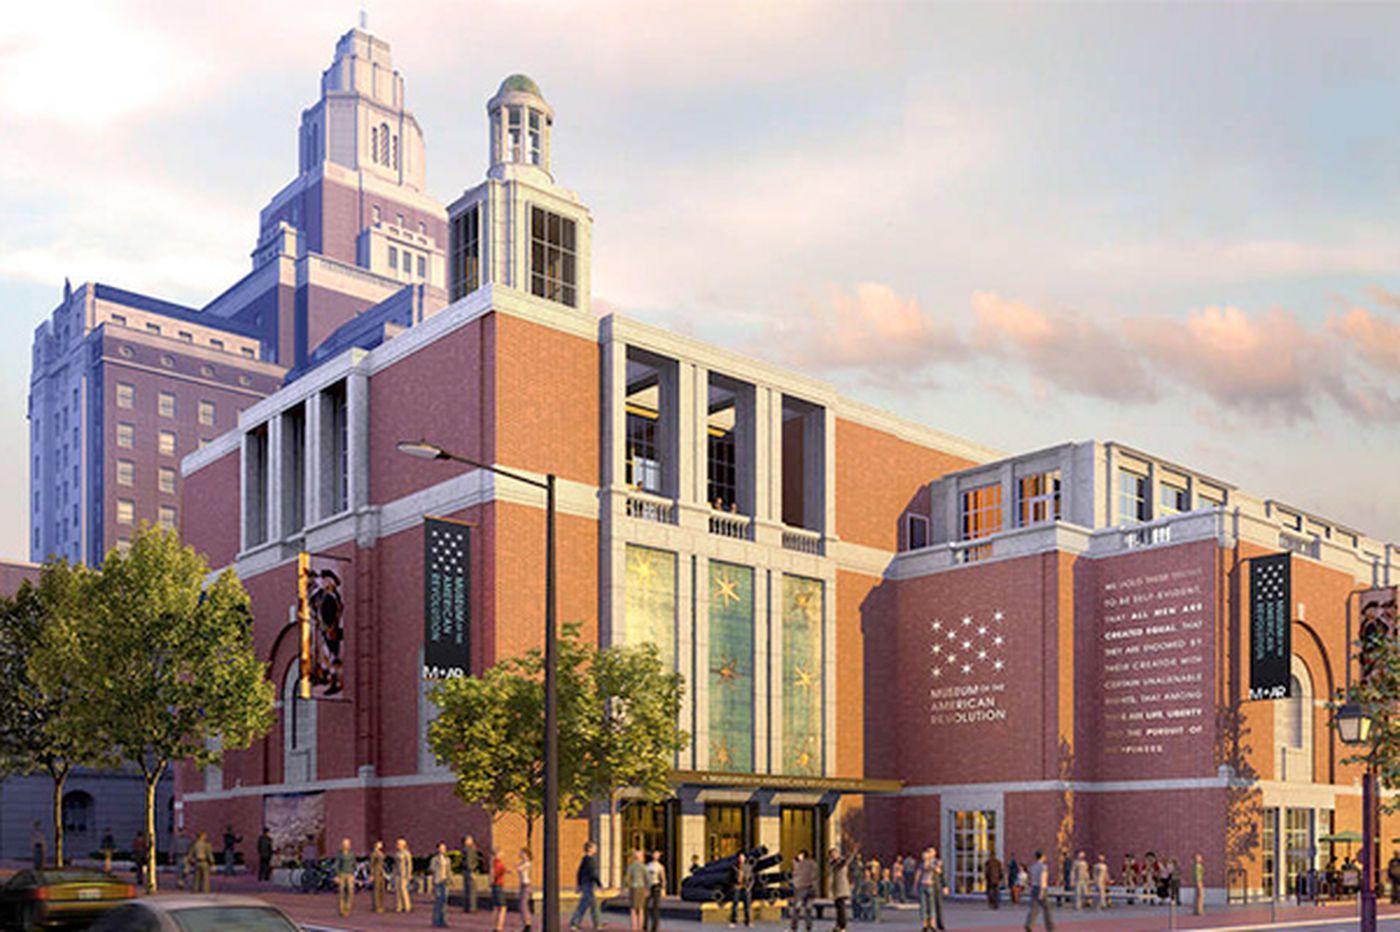 Changing Skyline: Stern rebuke: City tells museum architect to try again